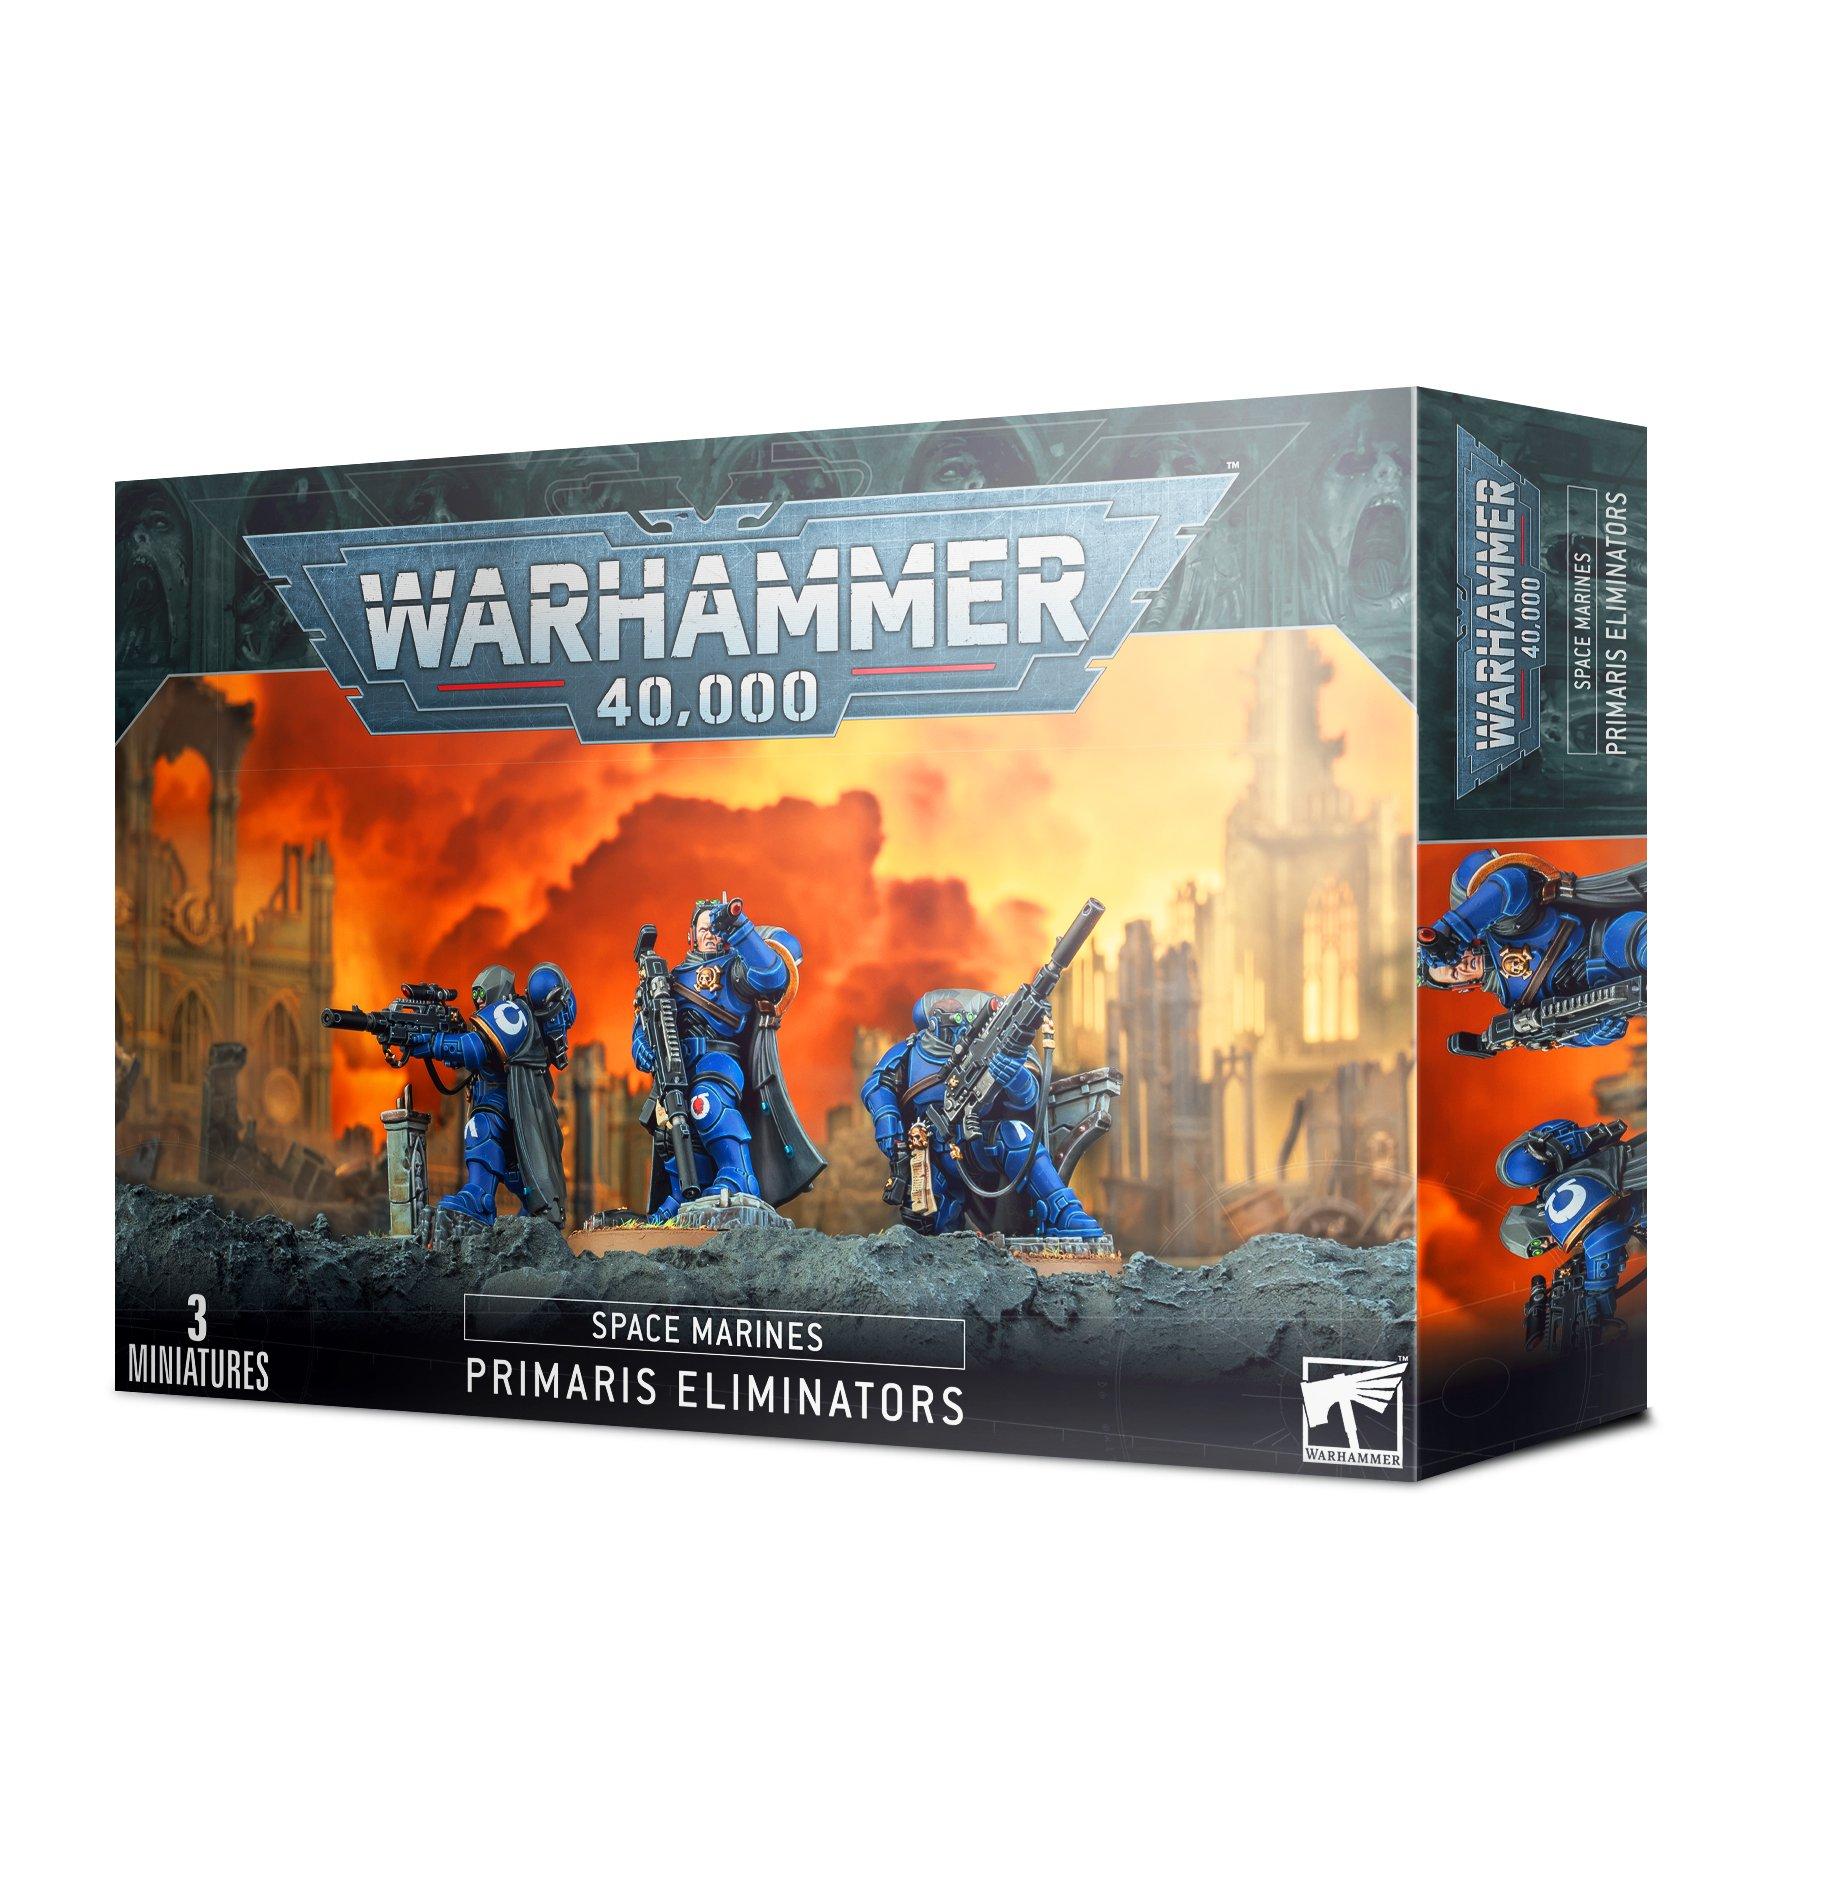 https___trade.games-workshop.com_assets_2020_11_BSF-48-93-99120101323-Space marines Primaris Eliminators